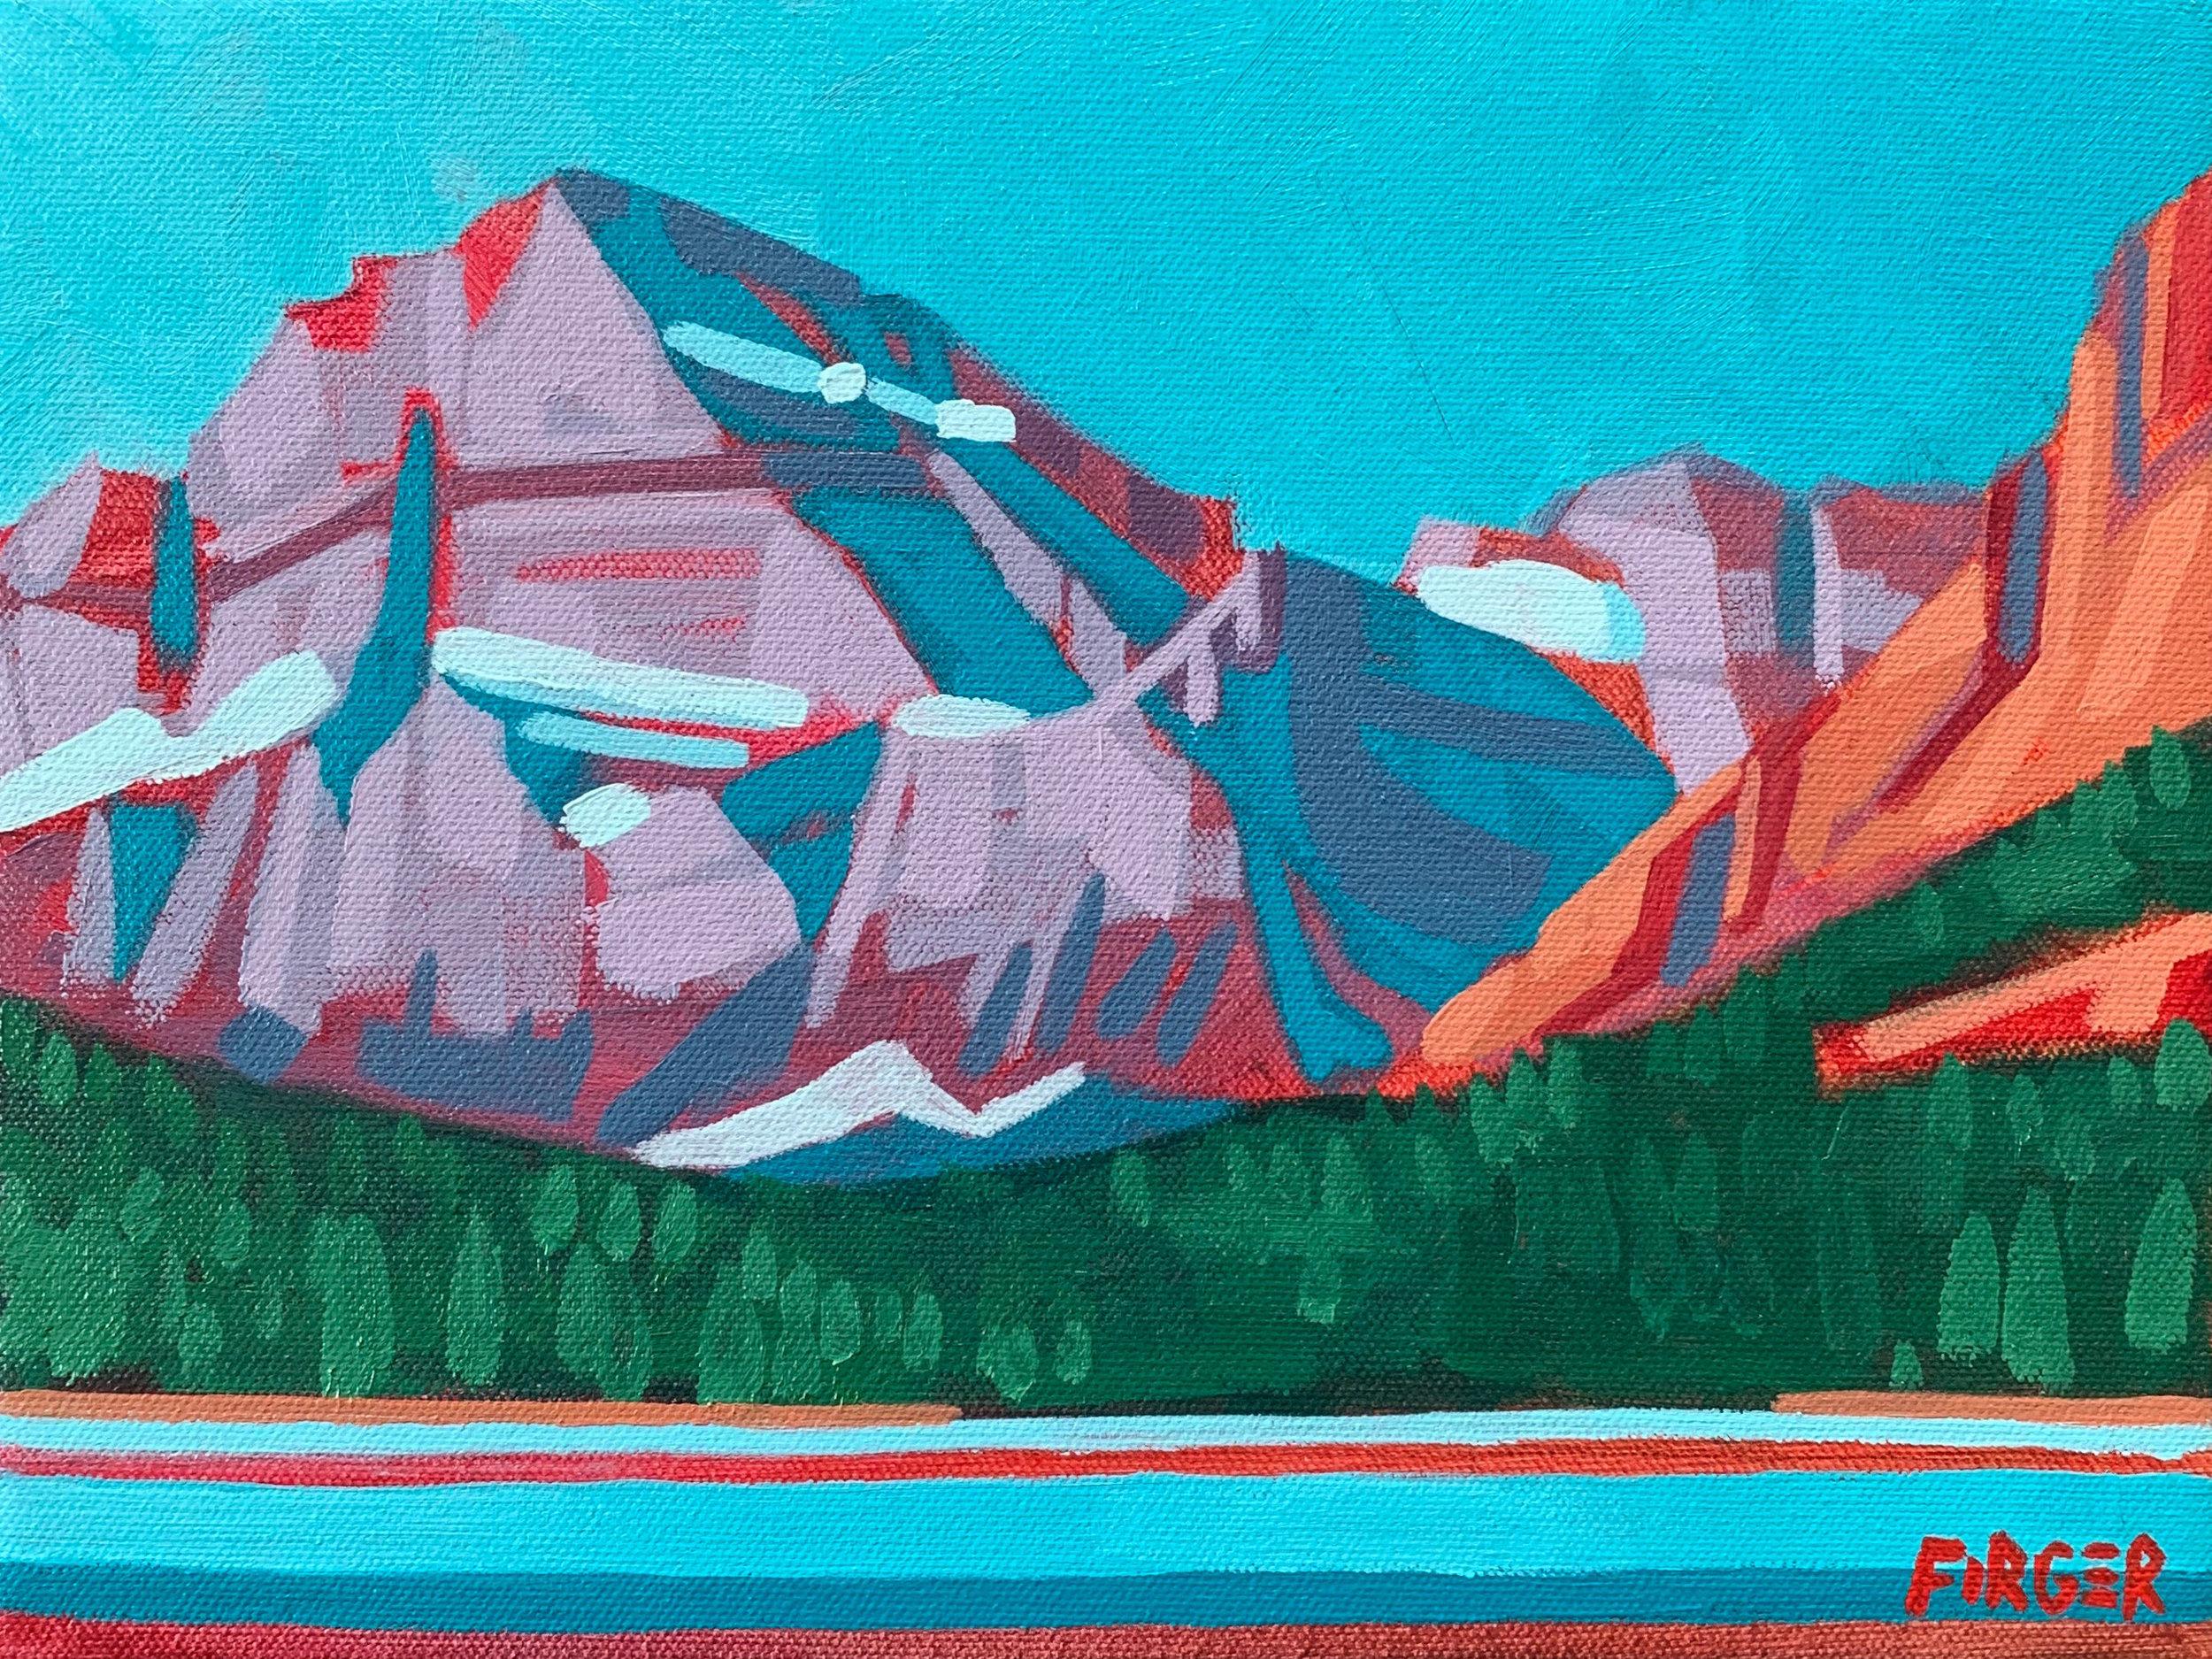 Mountain Colors - 9 x 12, Acrylic on Canvas